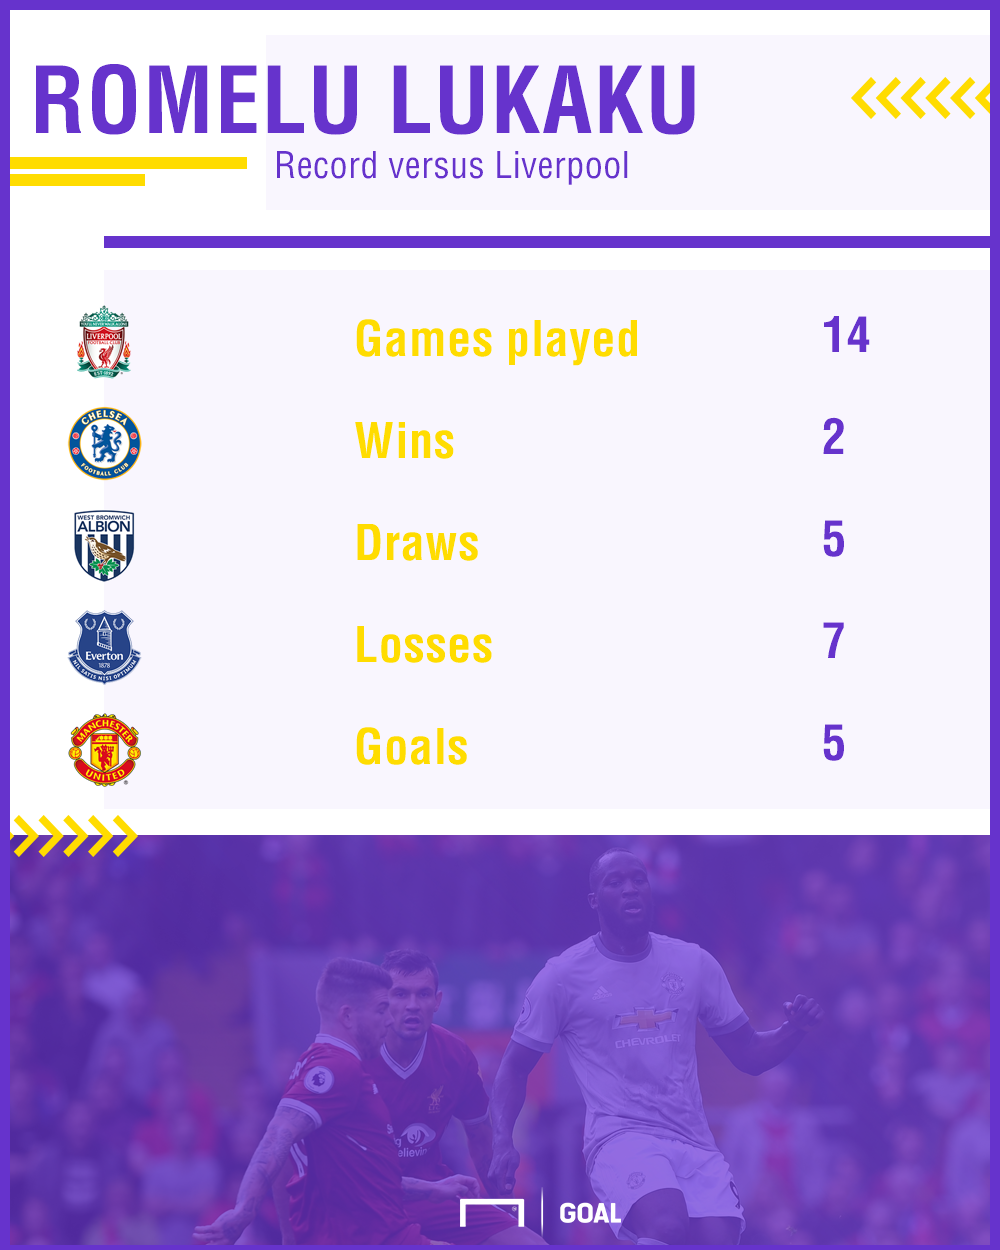 Romelu Lukaku record v Liverpool